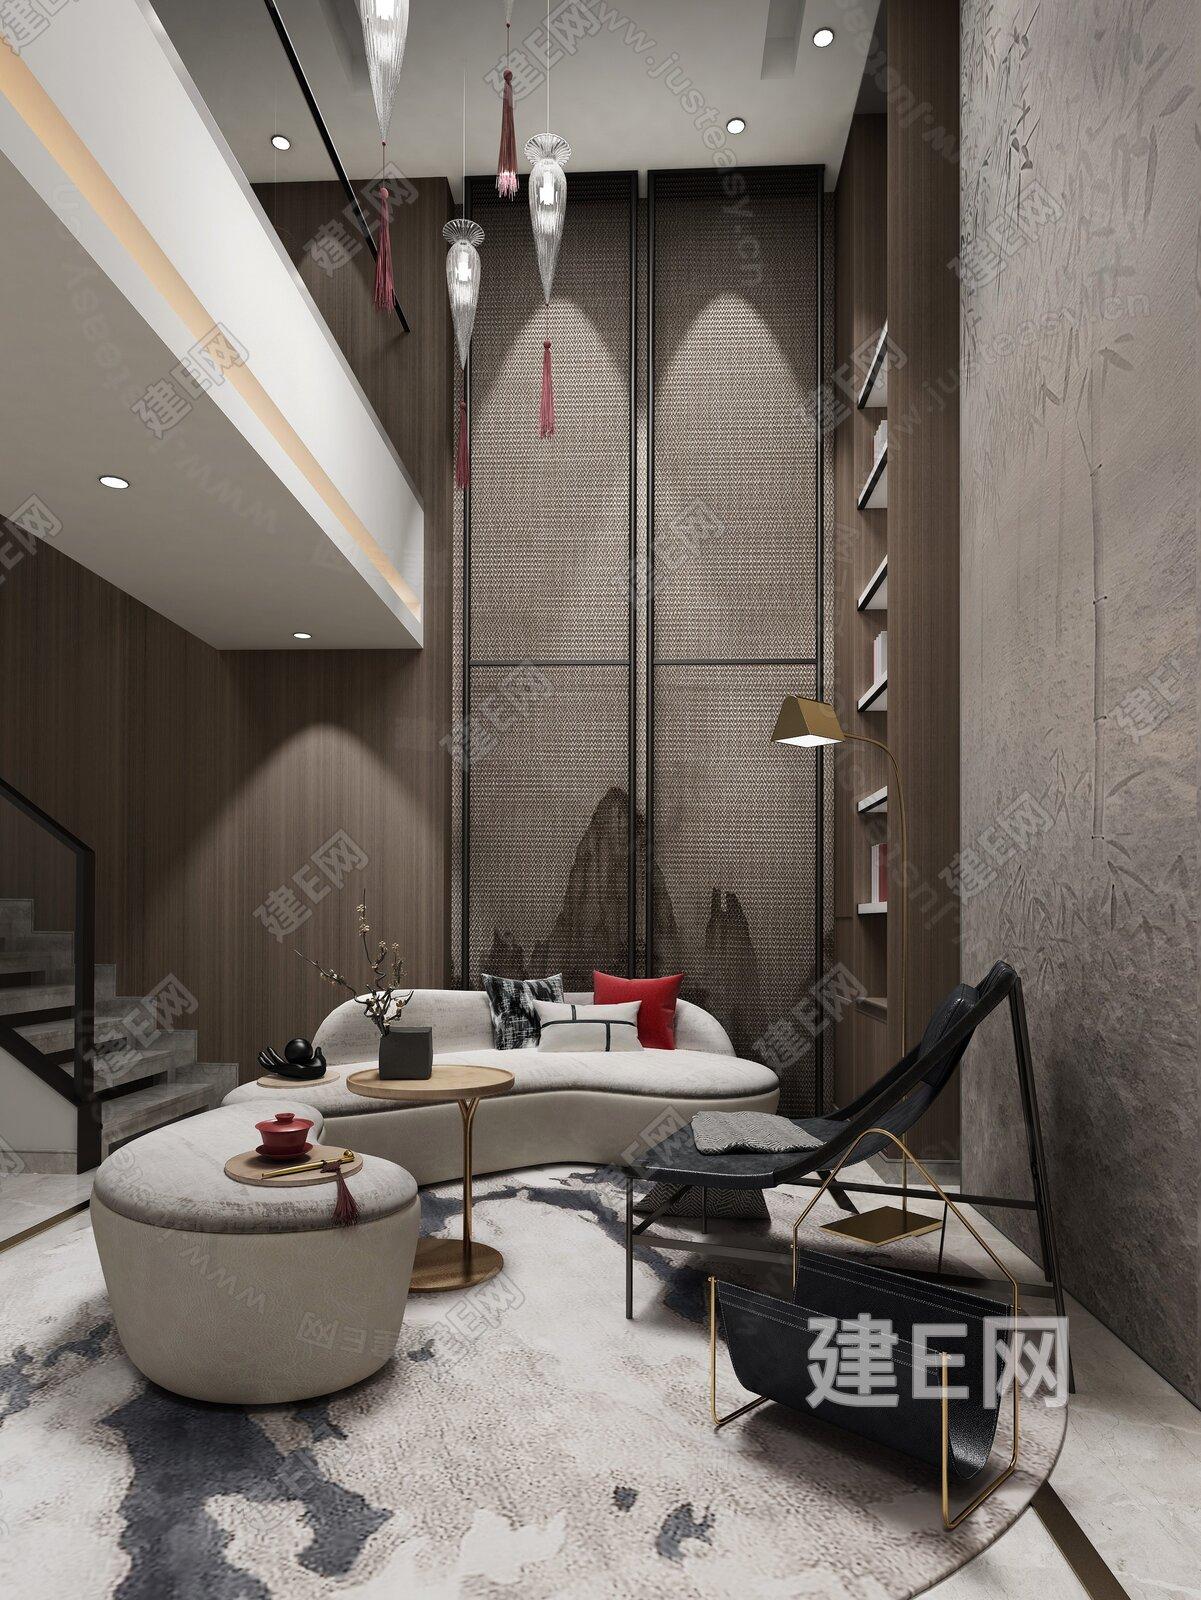 ZAD左木新作 新中式挑高客厅3d模型